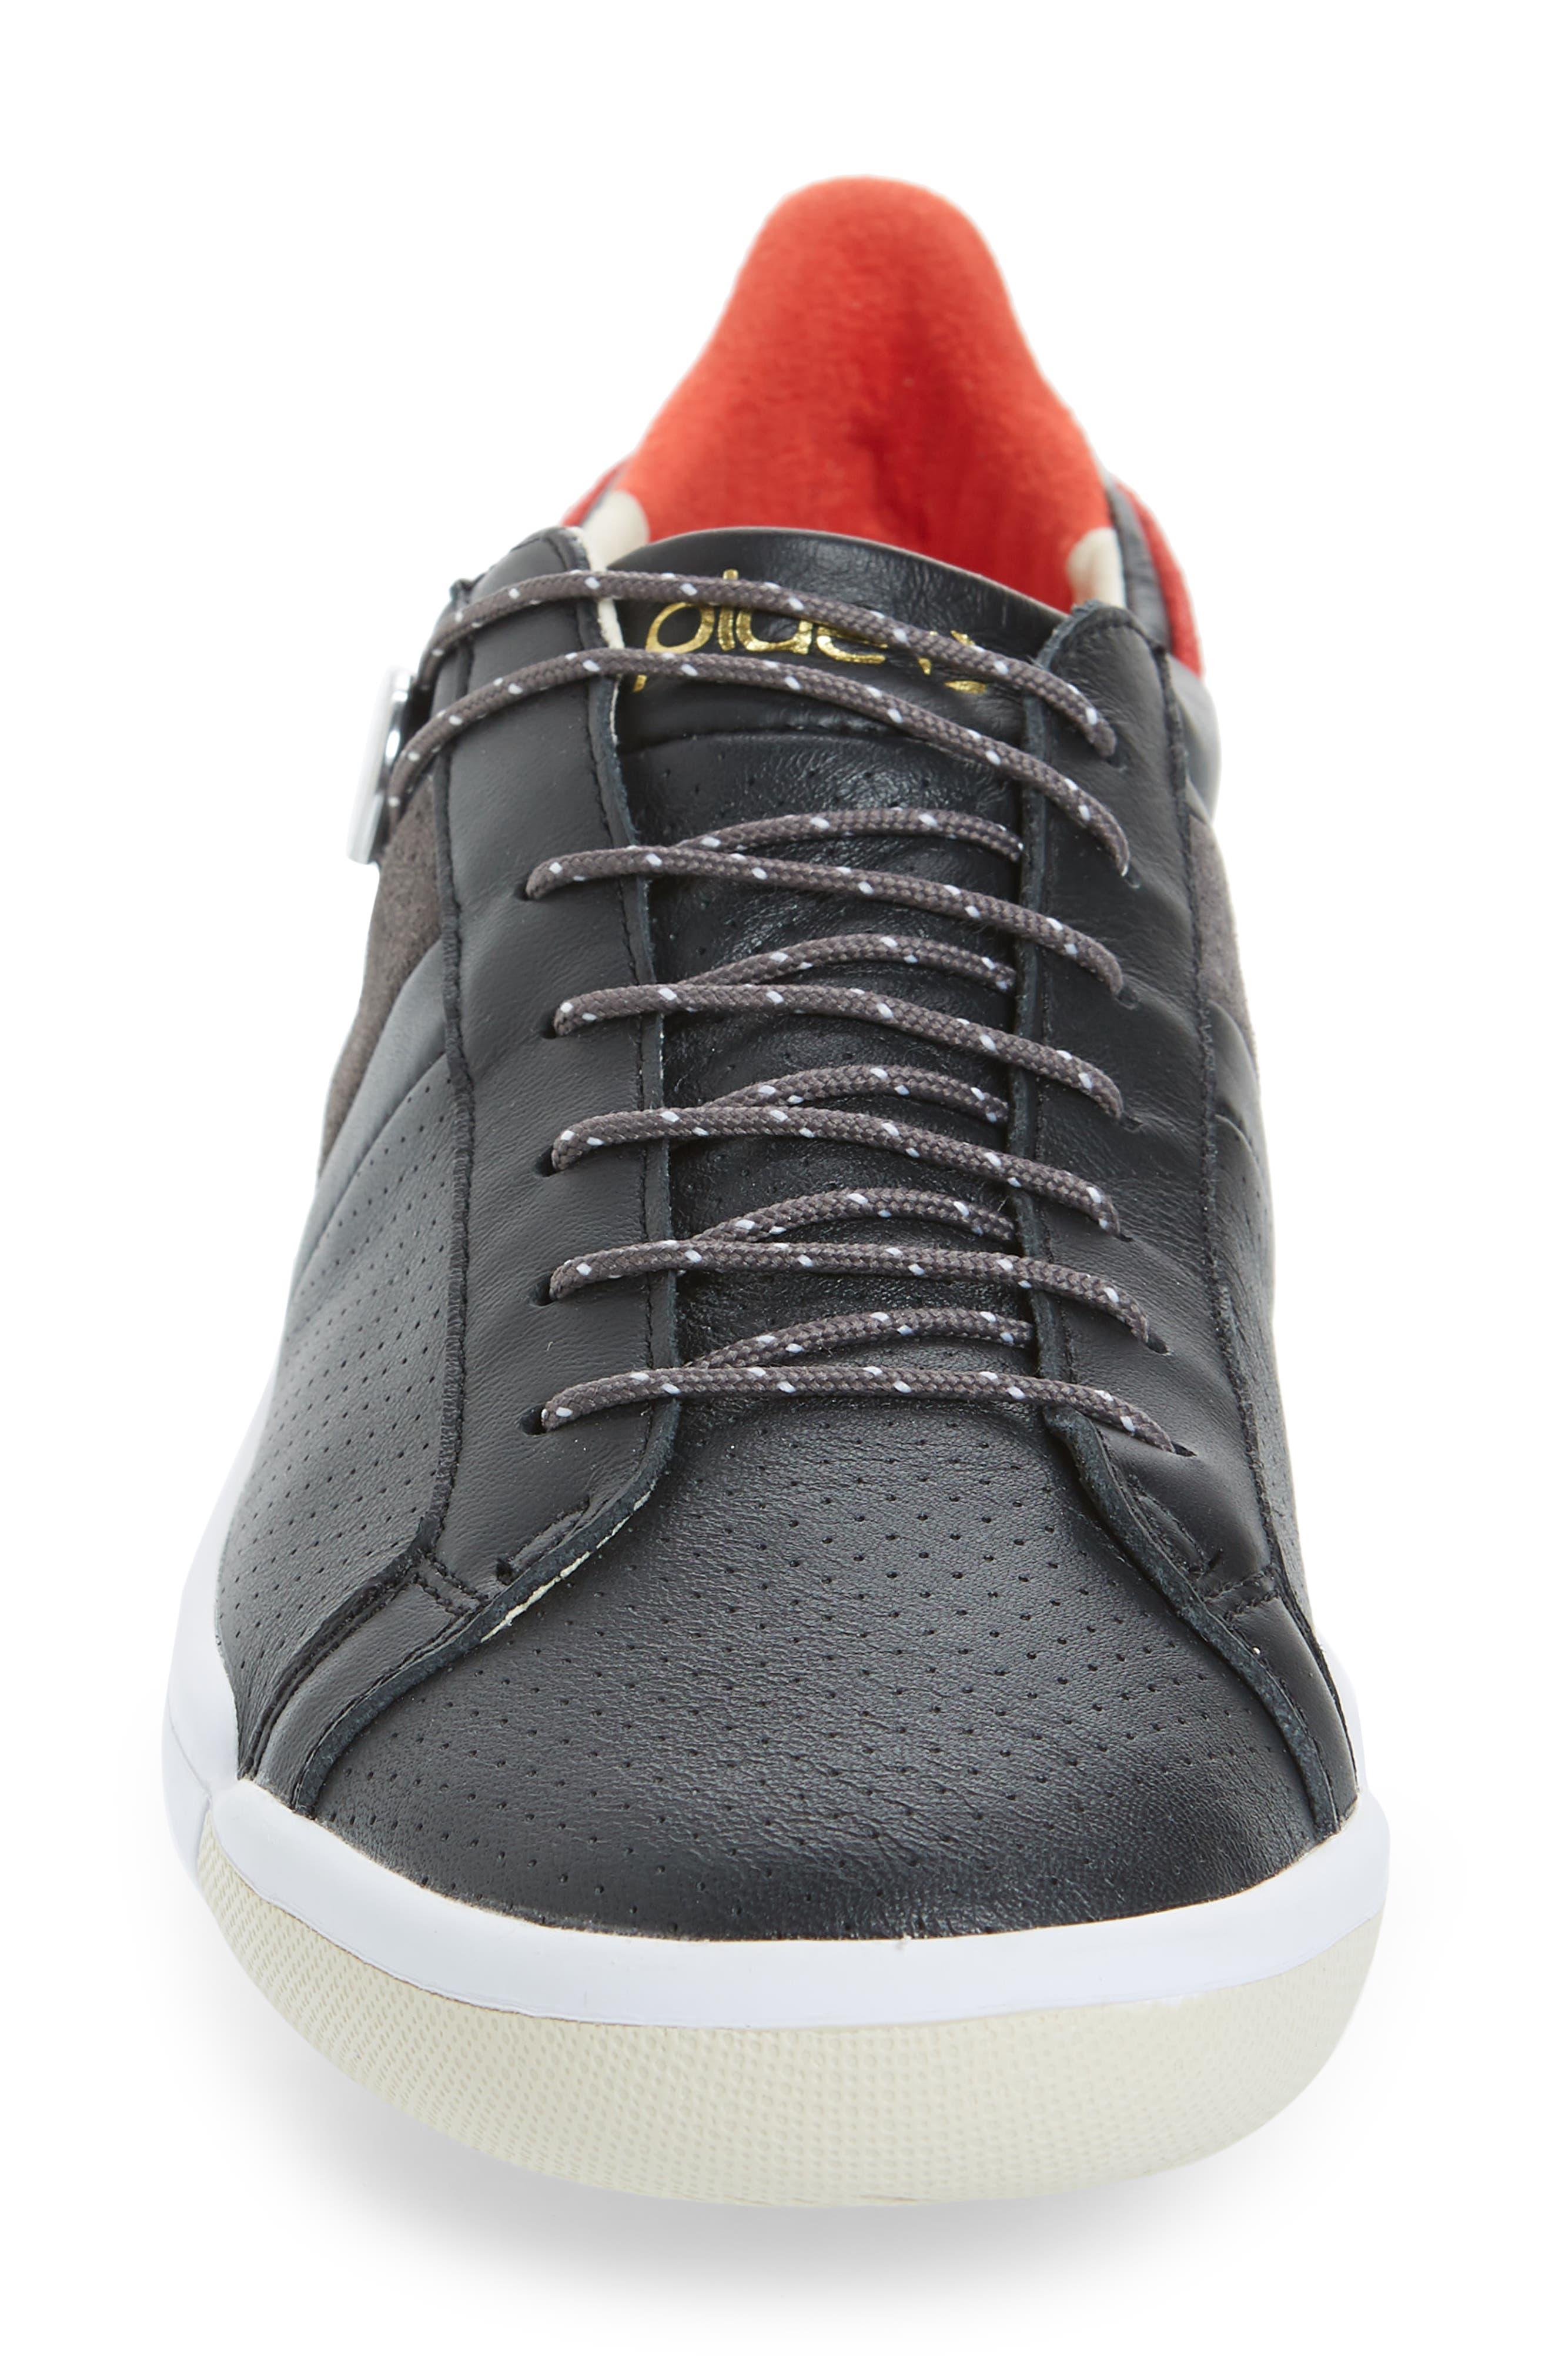 Mulberry Low Top Sneaker,                             Alternate thumbnail 4, color,                             Black